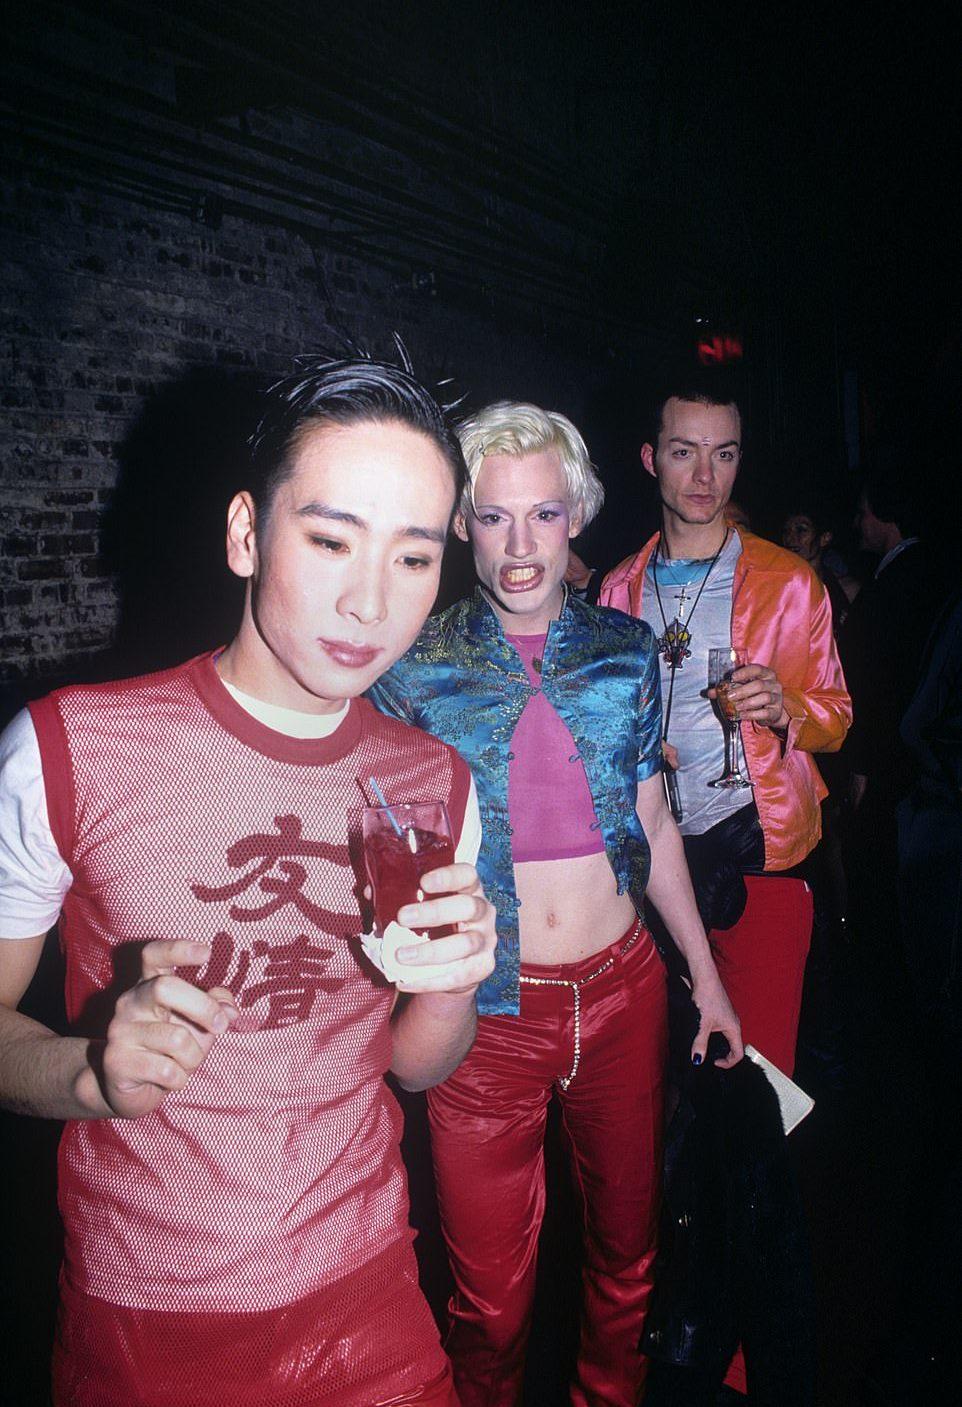 Ночная жизнь клубов Нью-Йорка 1990-х на снимках Стива Эйхнера